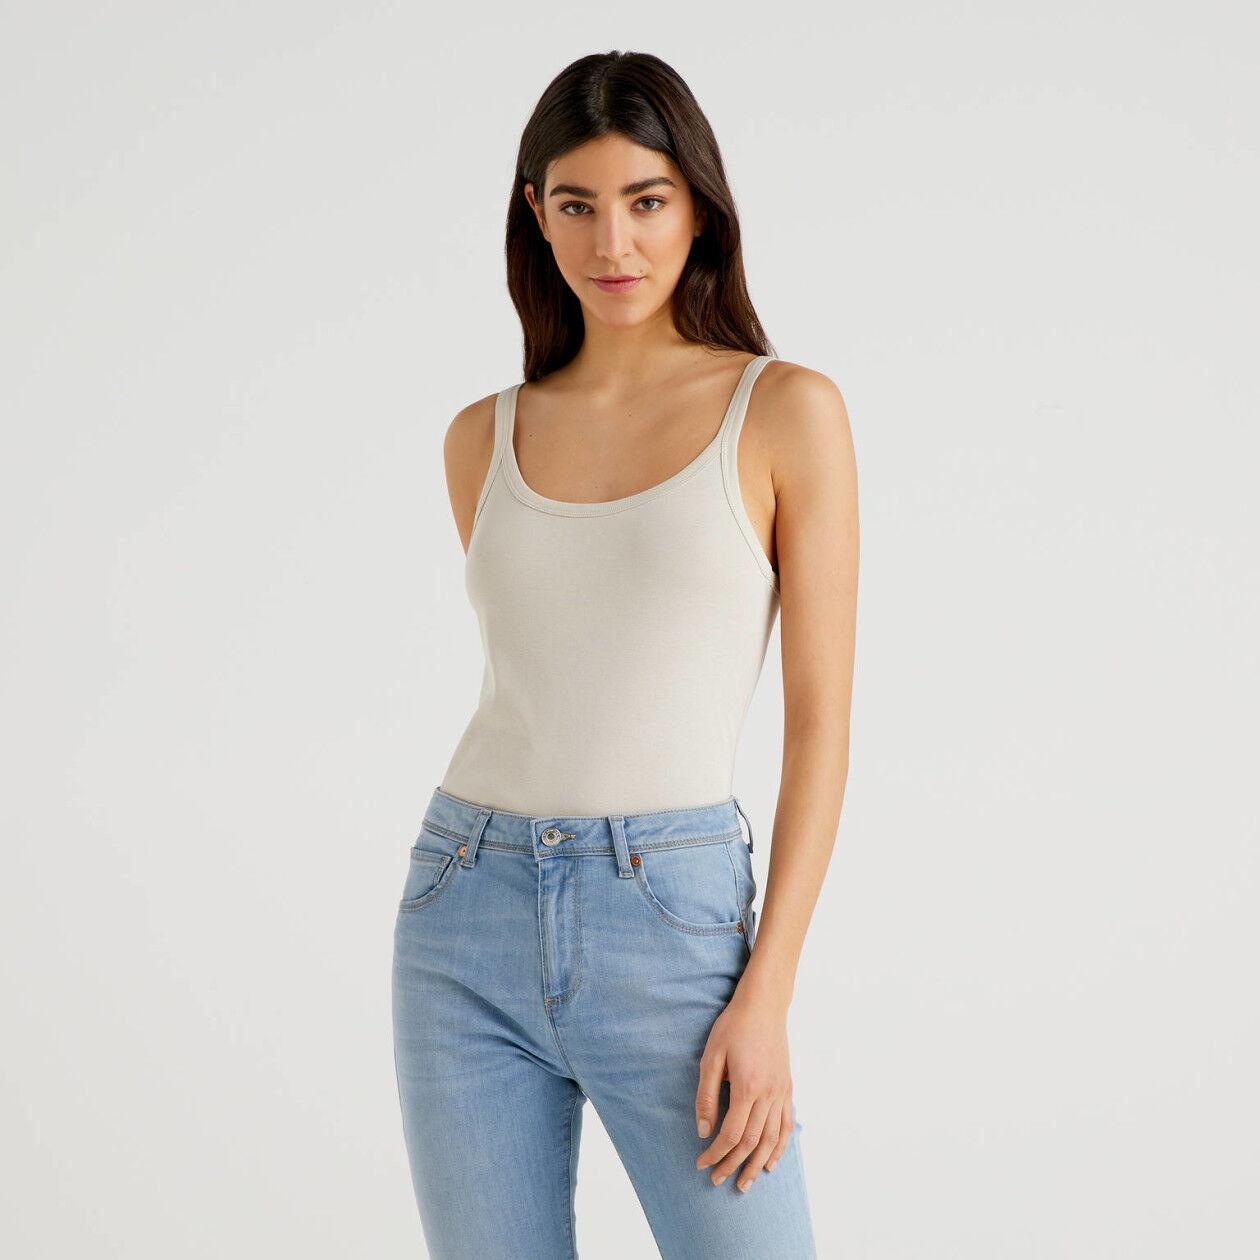 Camiseta de tirantes beige de algodón puro